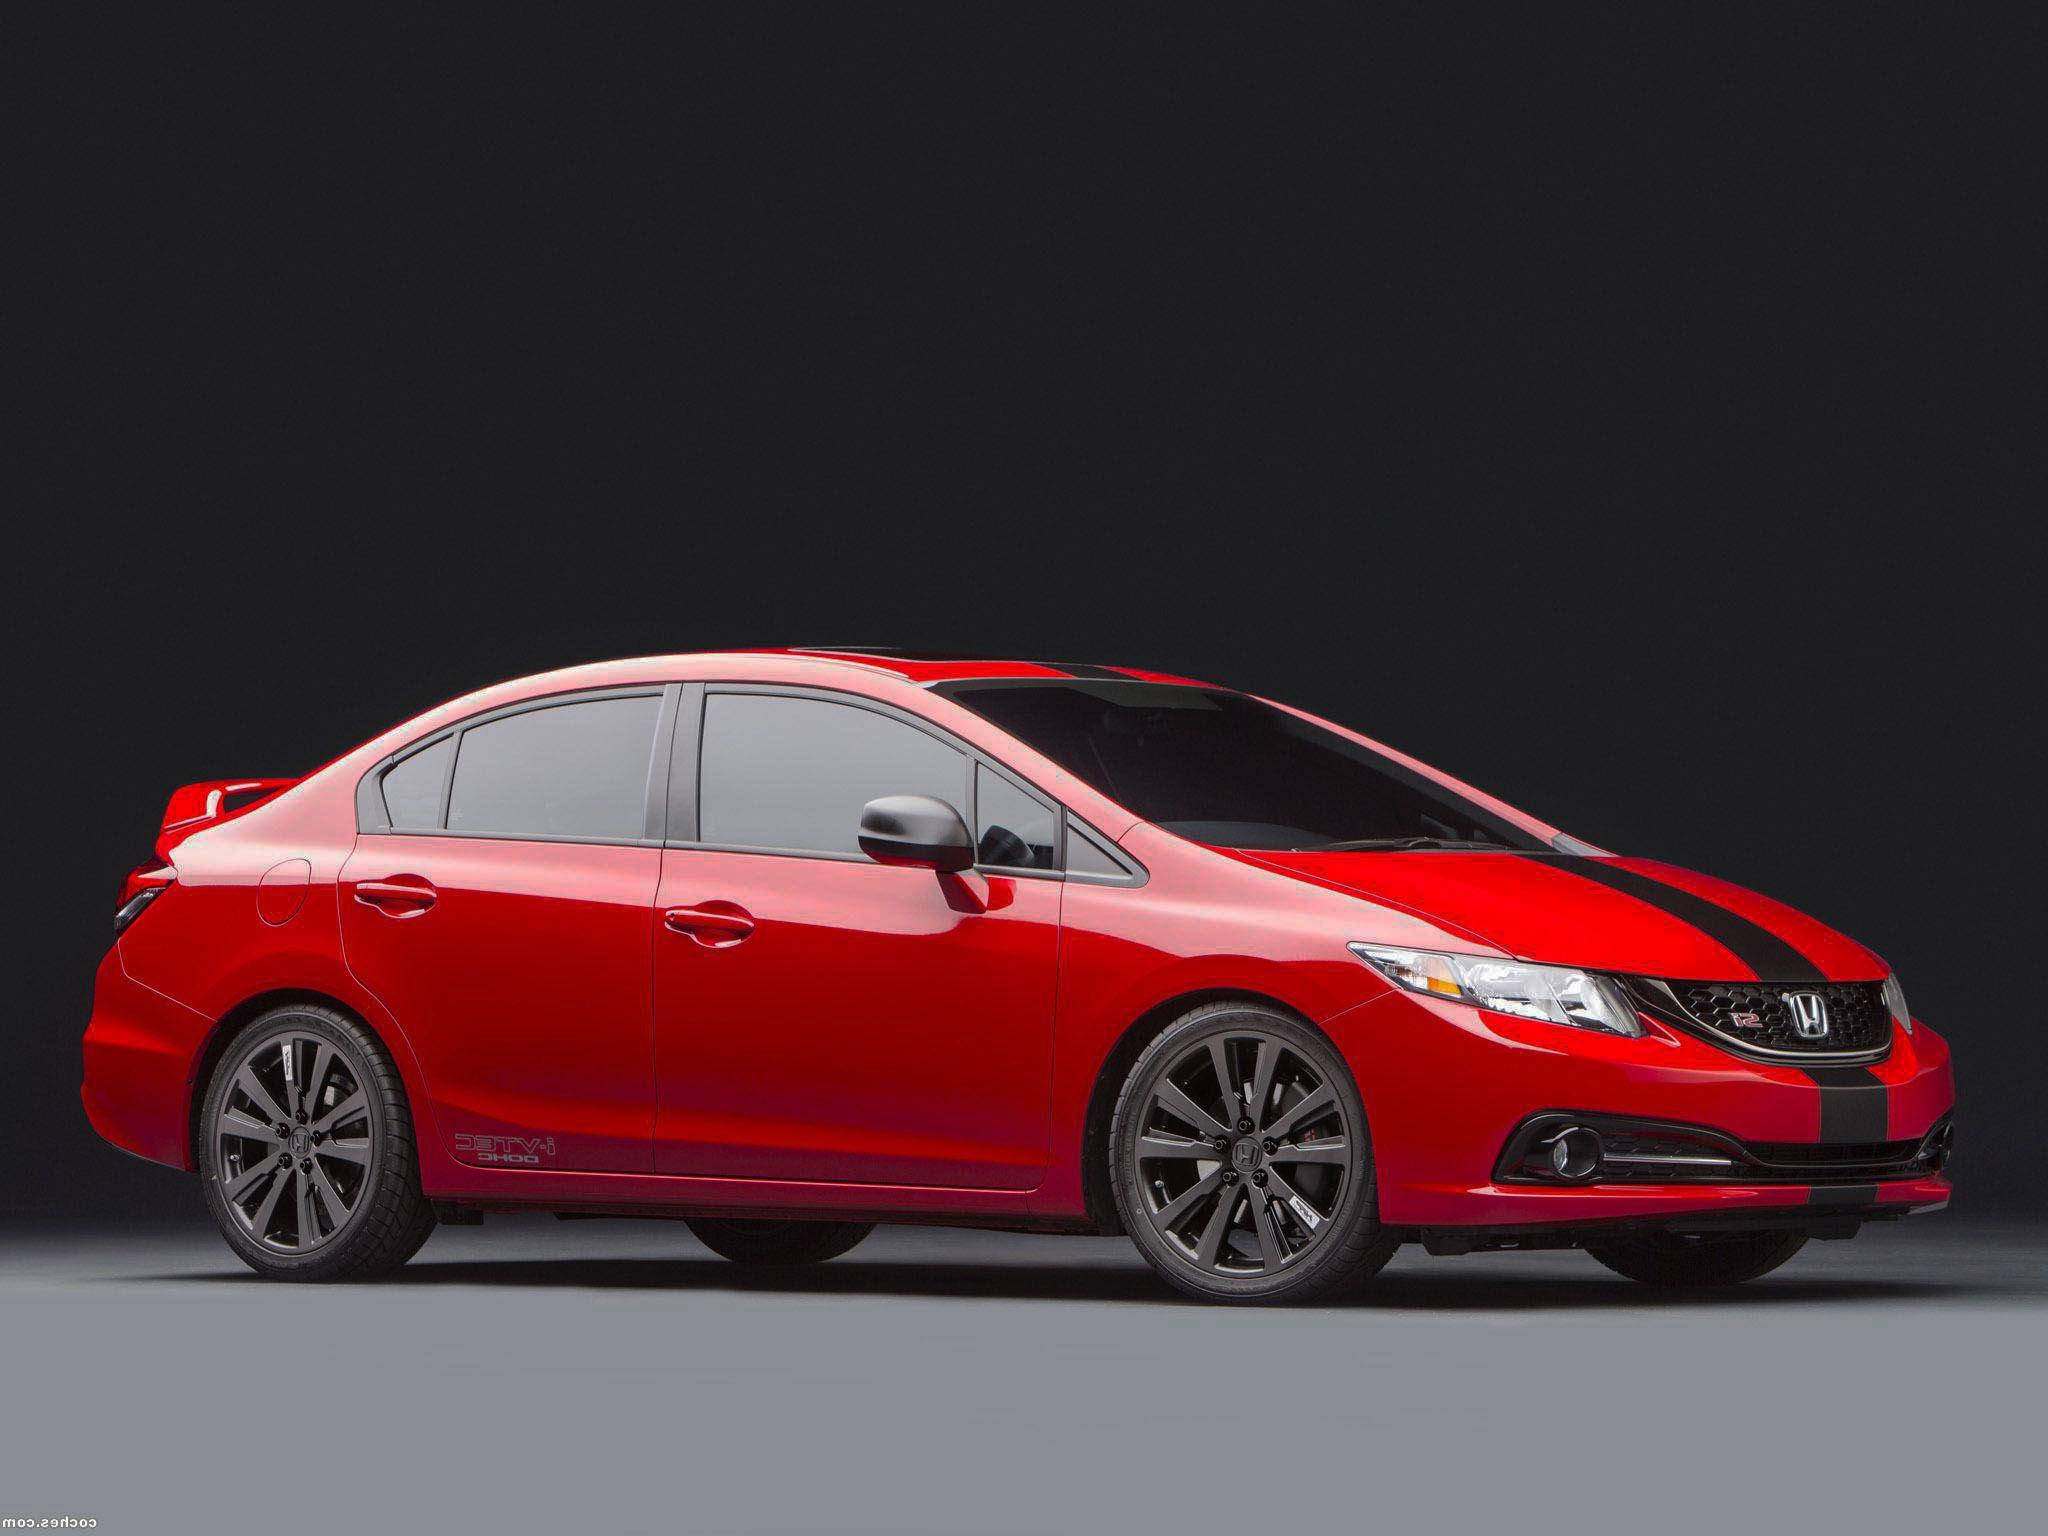 2015 honda civic si sedan concept sleek and sporty new automaker